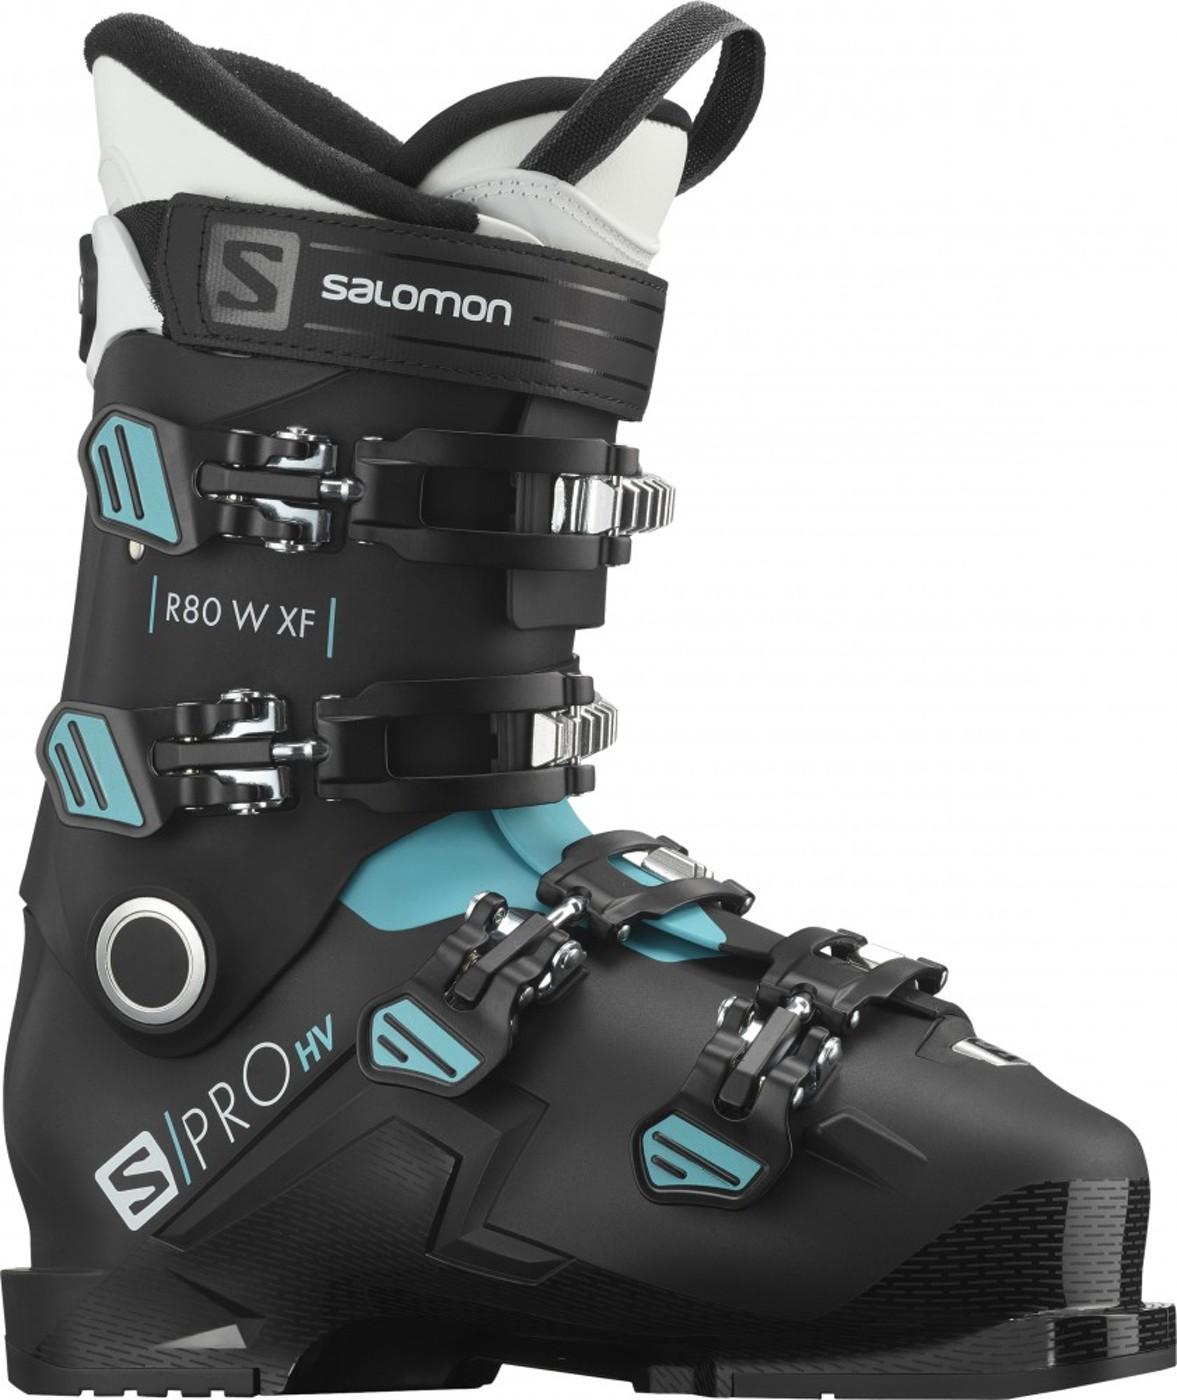 SALOMON S/PRO HV R80 W XF - Damen